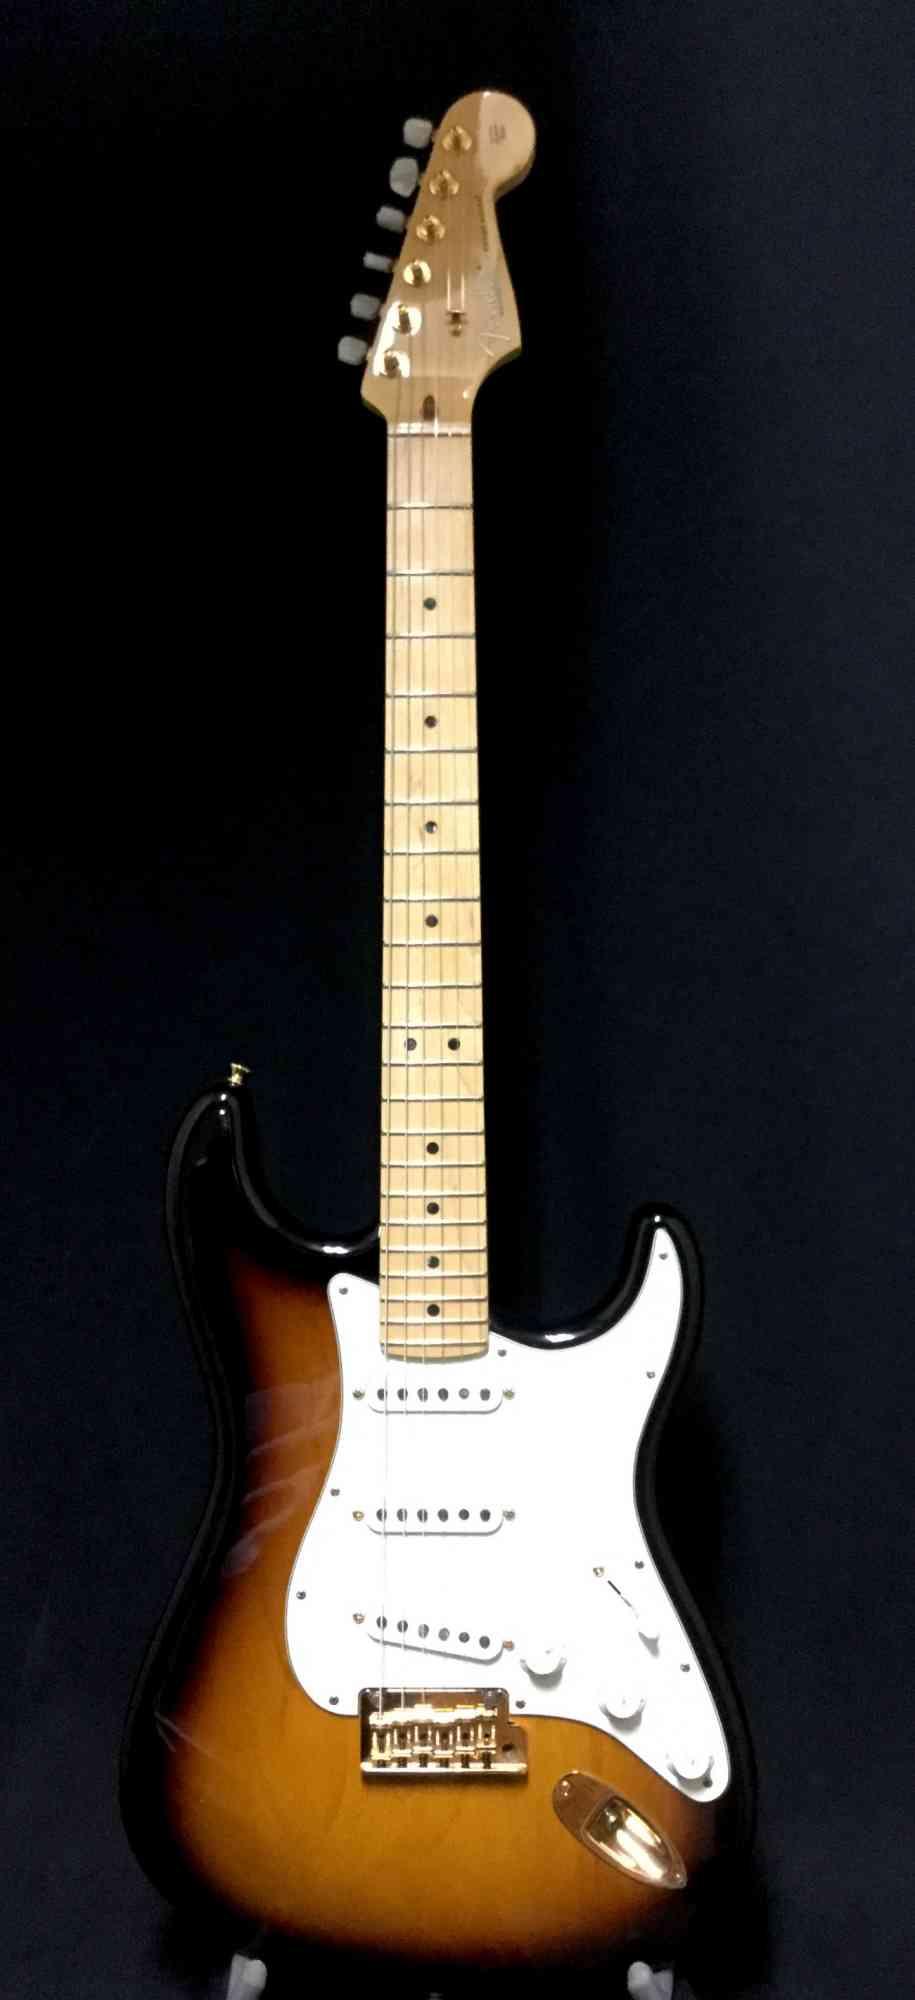 Fender 60th Anniversary Stratocaster 2014 Sunburst. Click to enlarge